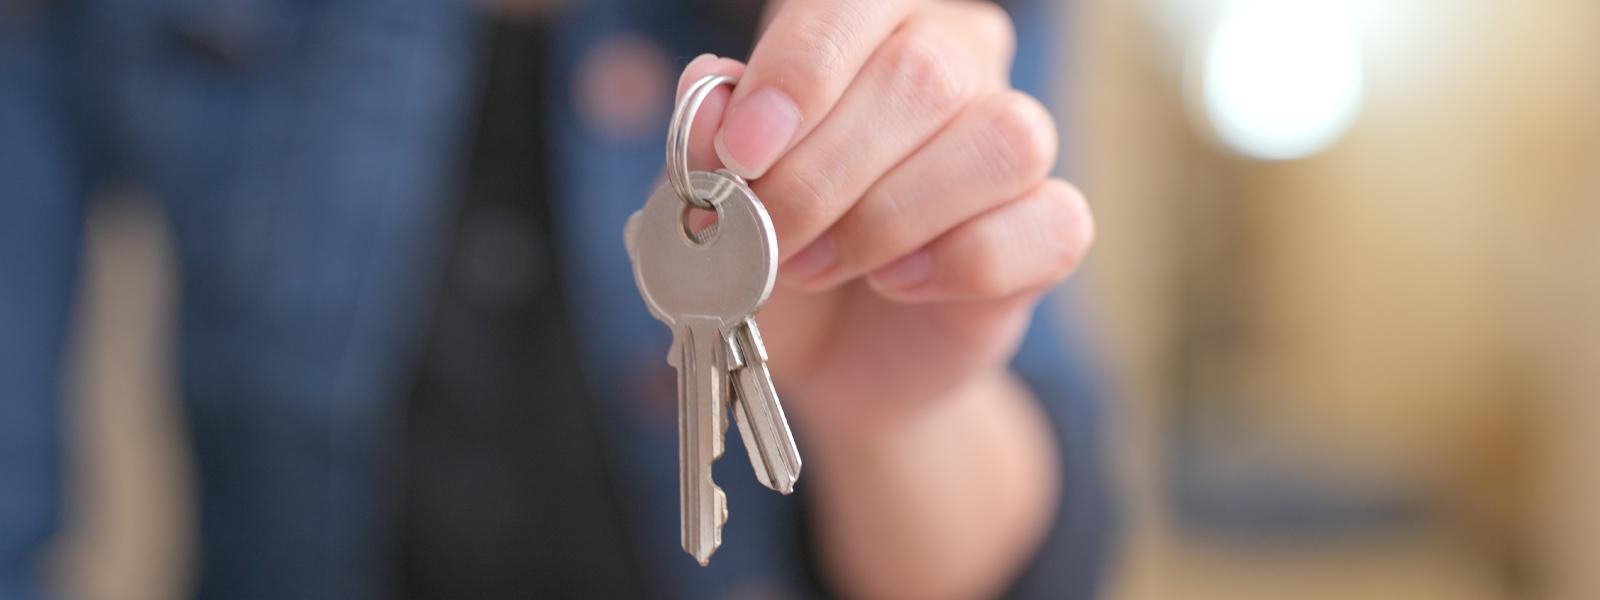 When should I change my door locks? - Echidna Lock & Key